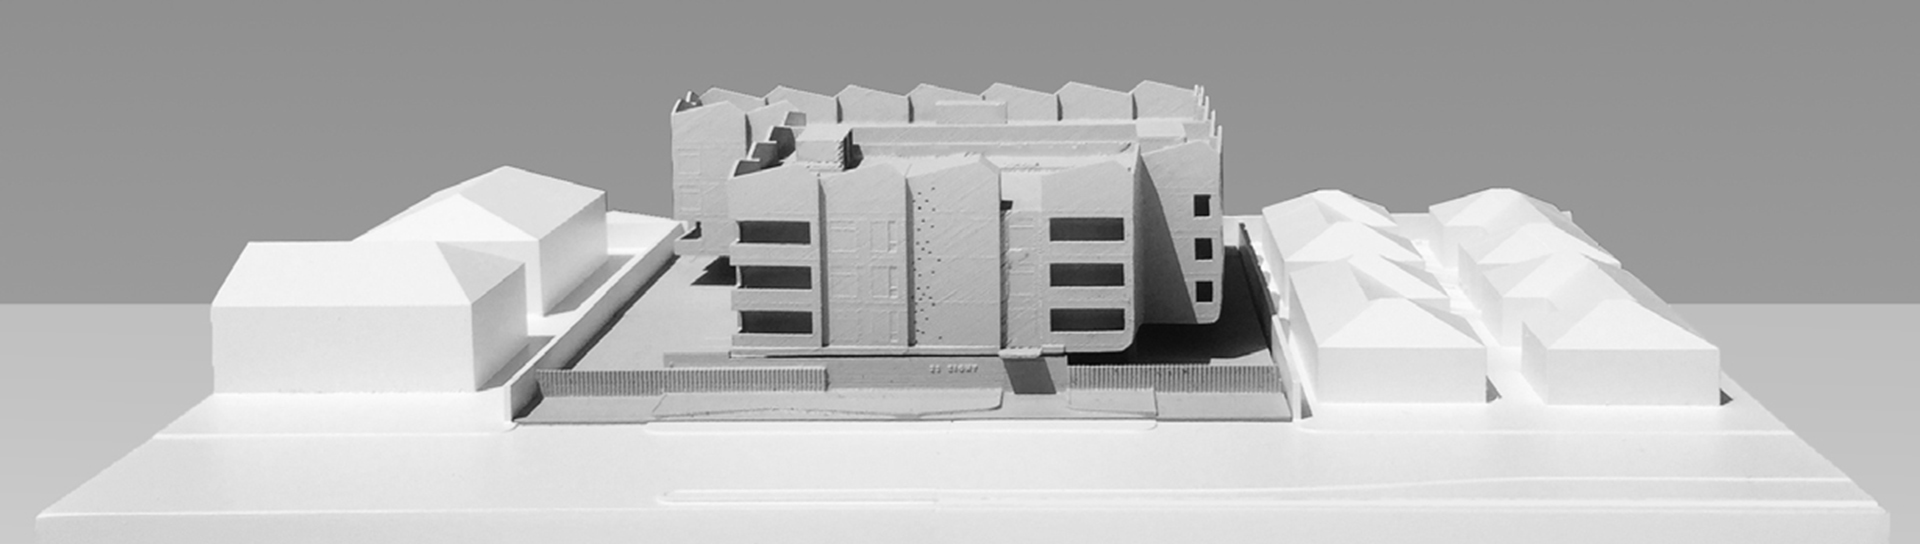 3D nyomtatott házmodell